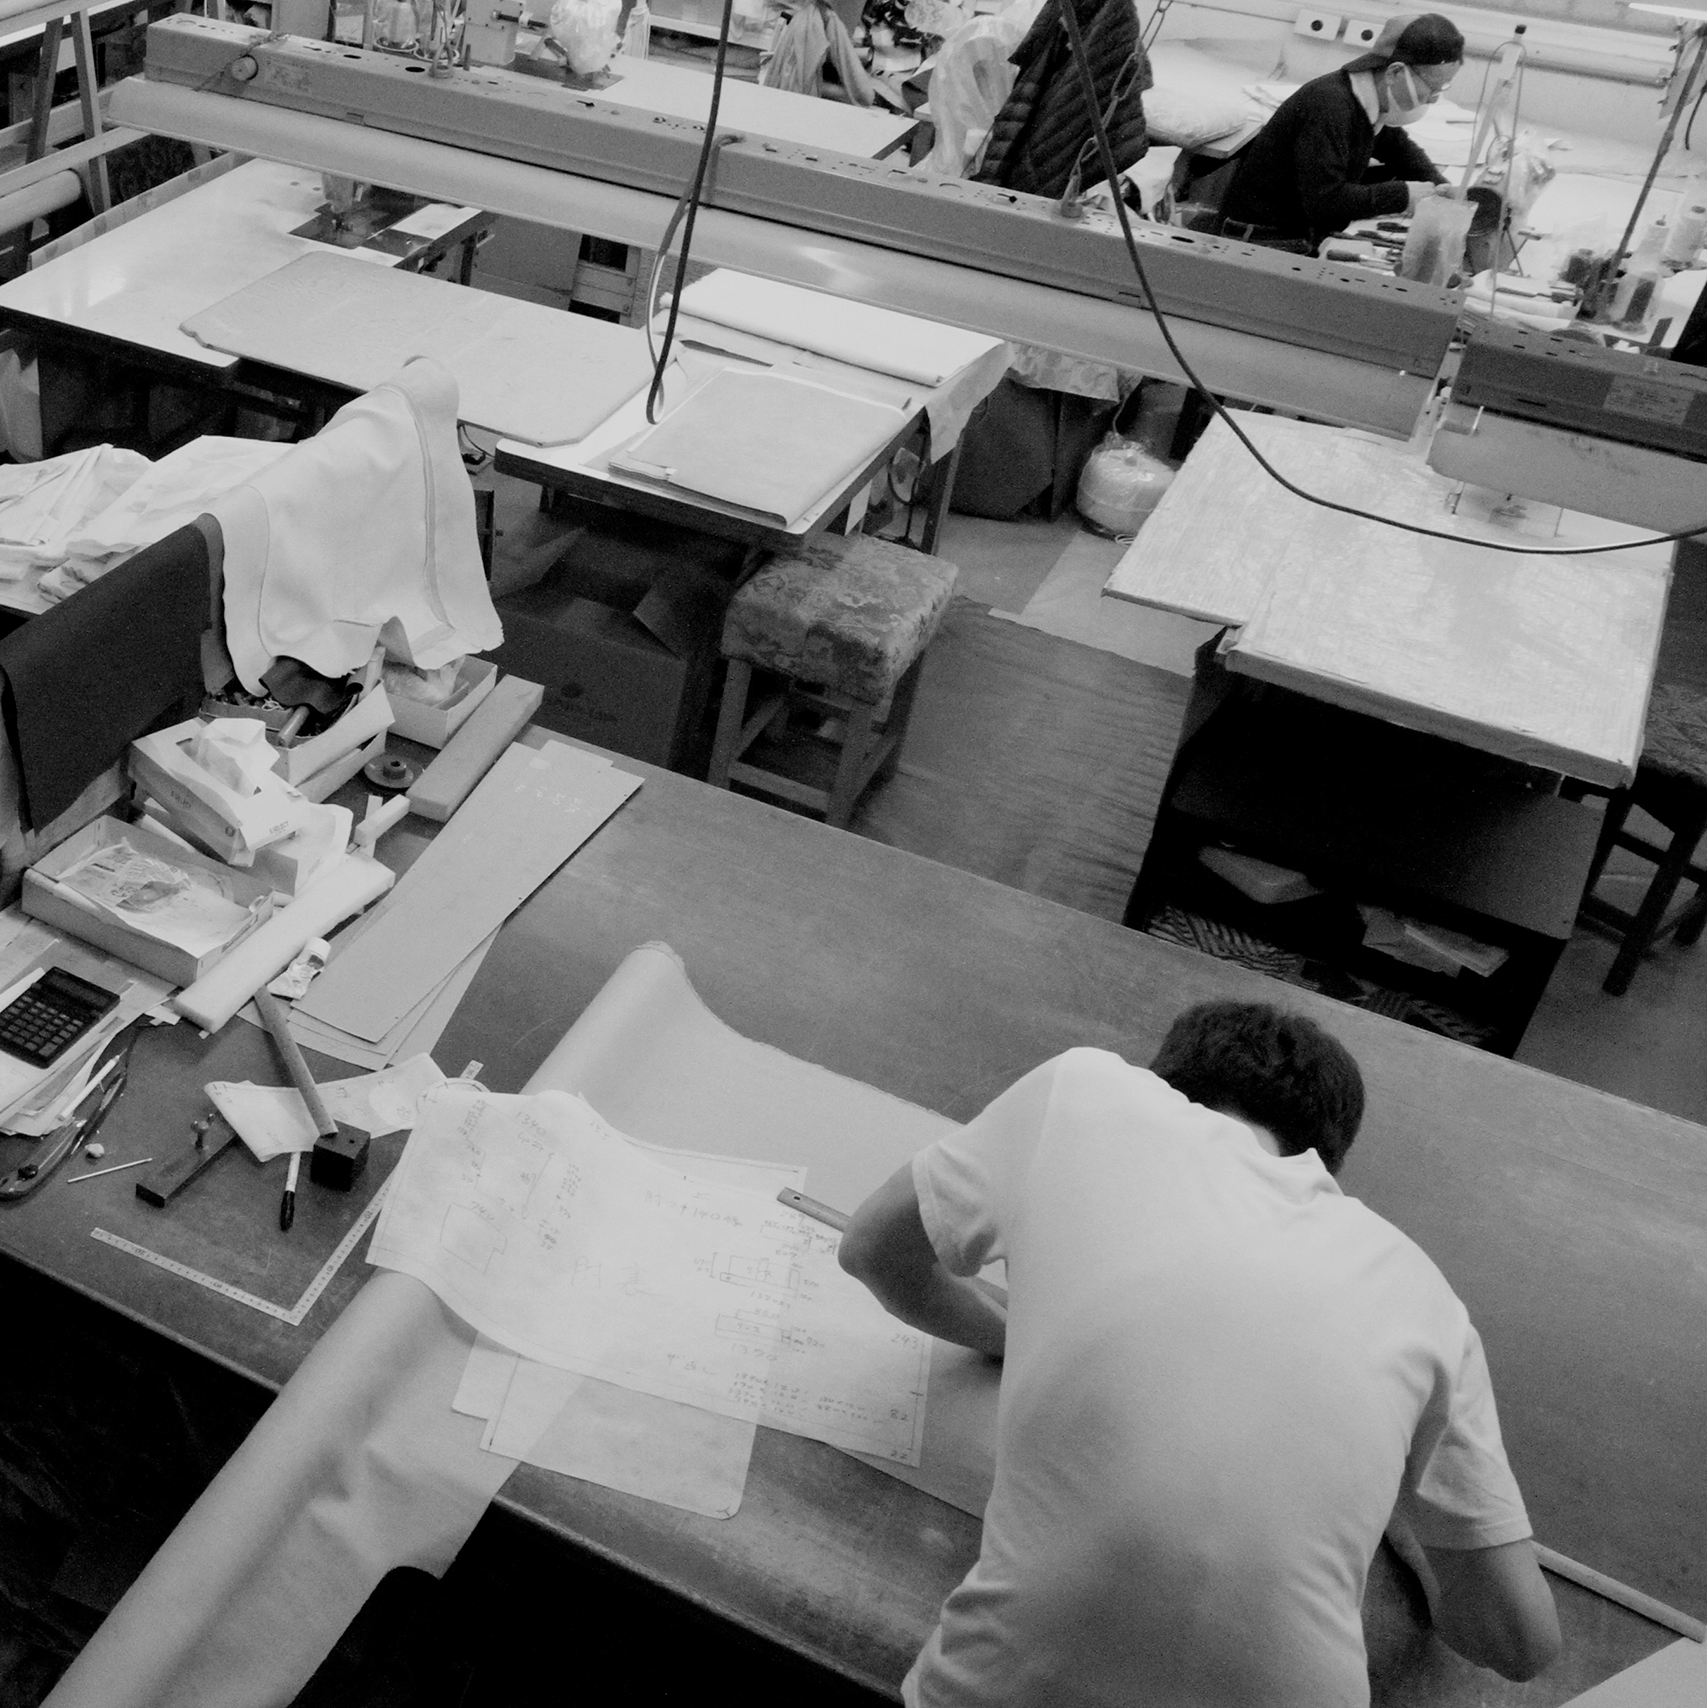 奈技工房の歴史